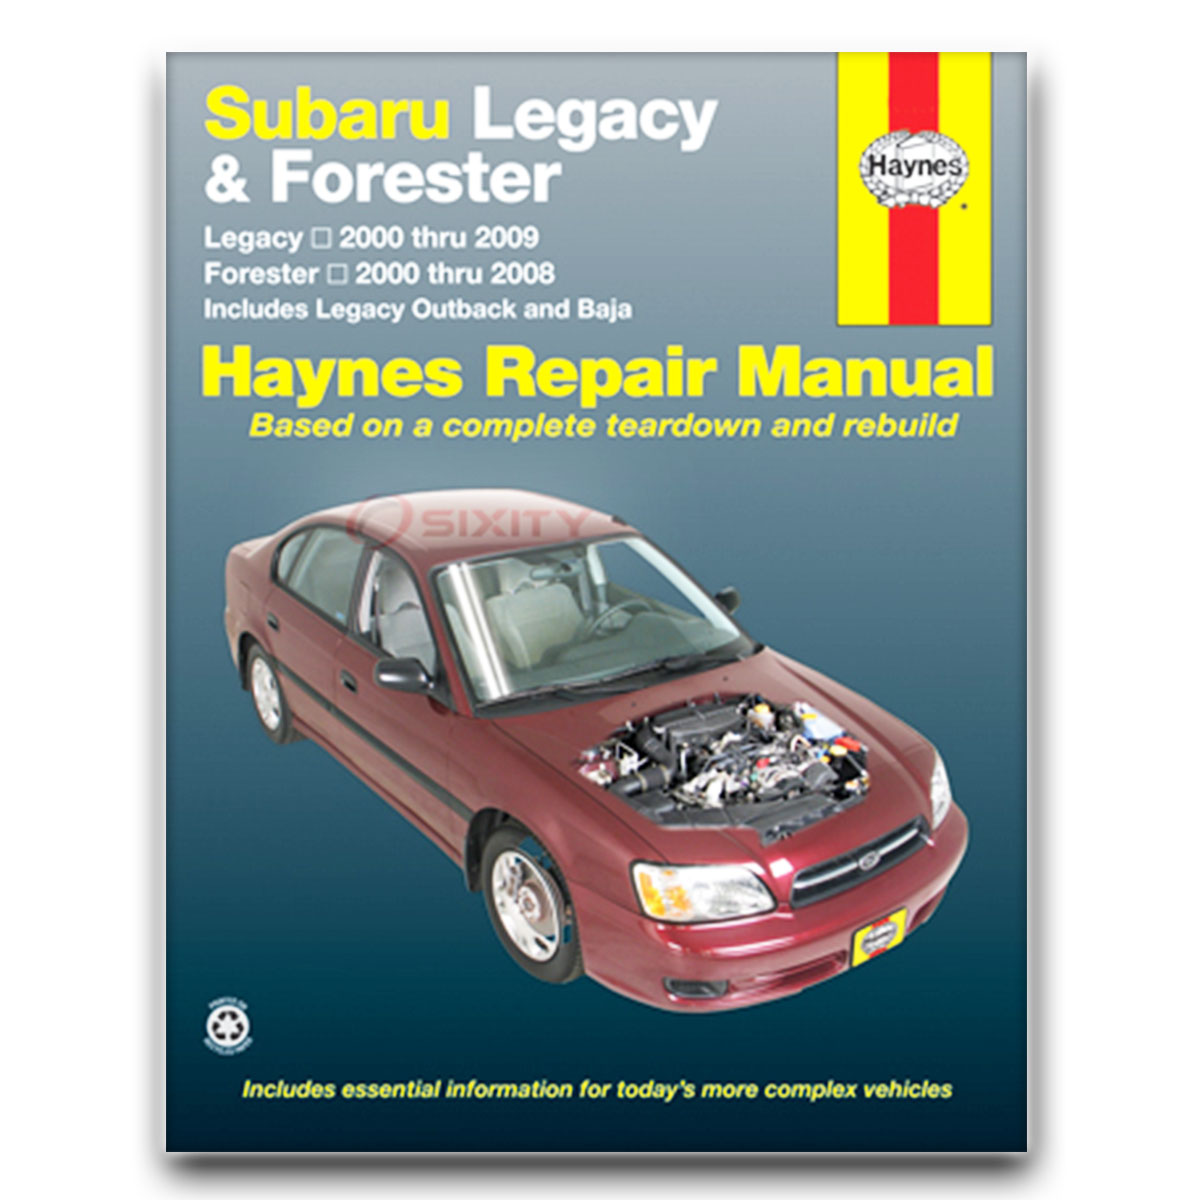 haynes subaru legacy 00 09 forester 00 08 repair manual 89101 shop rh ebay com subaru outback shop manual pdf subaru shop manual printed helm